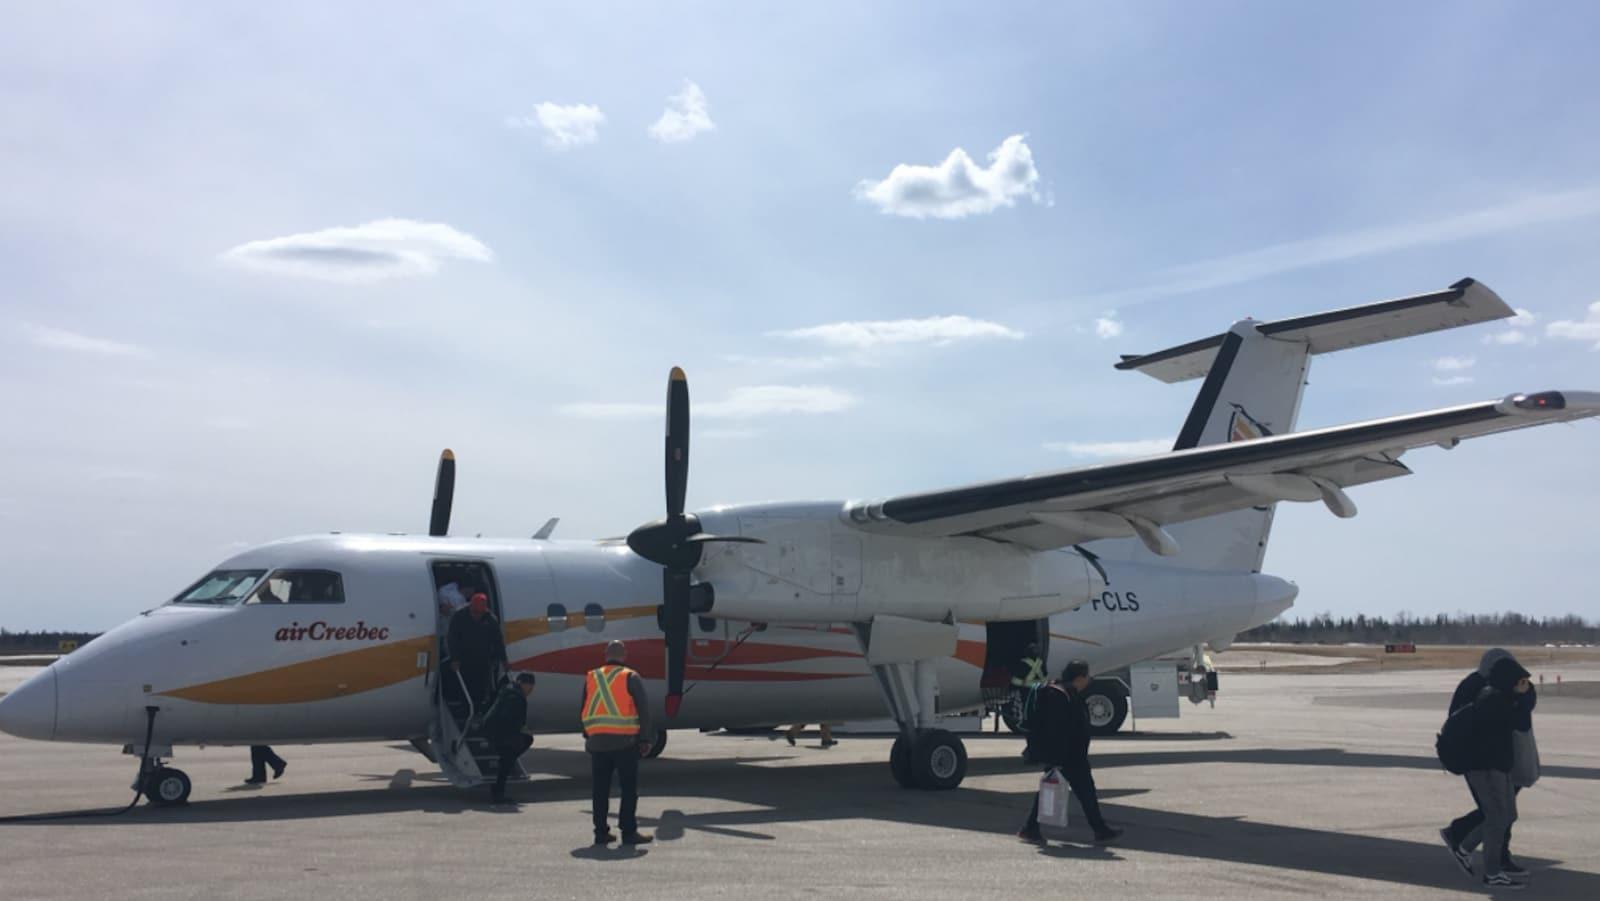 Des personnes débarquent d'un avion de la compagnie Air Creebec.